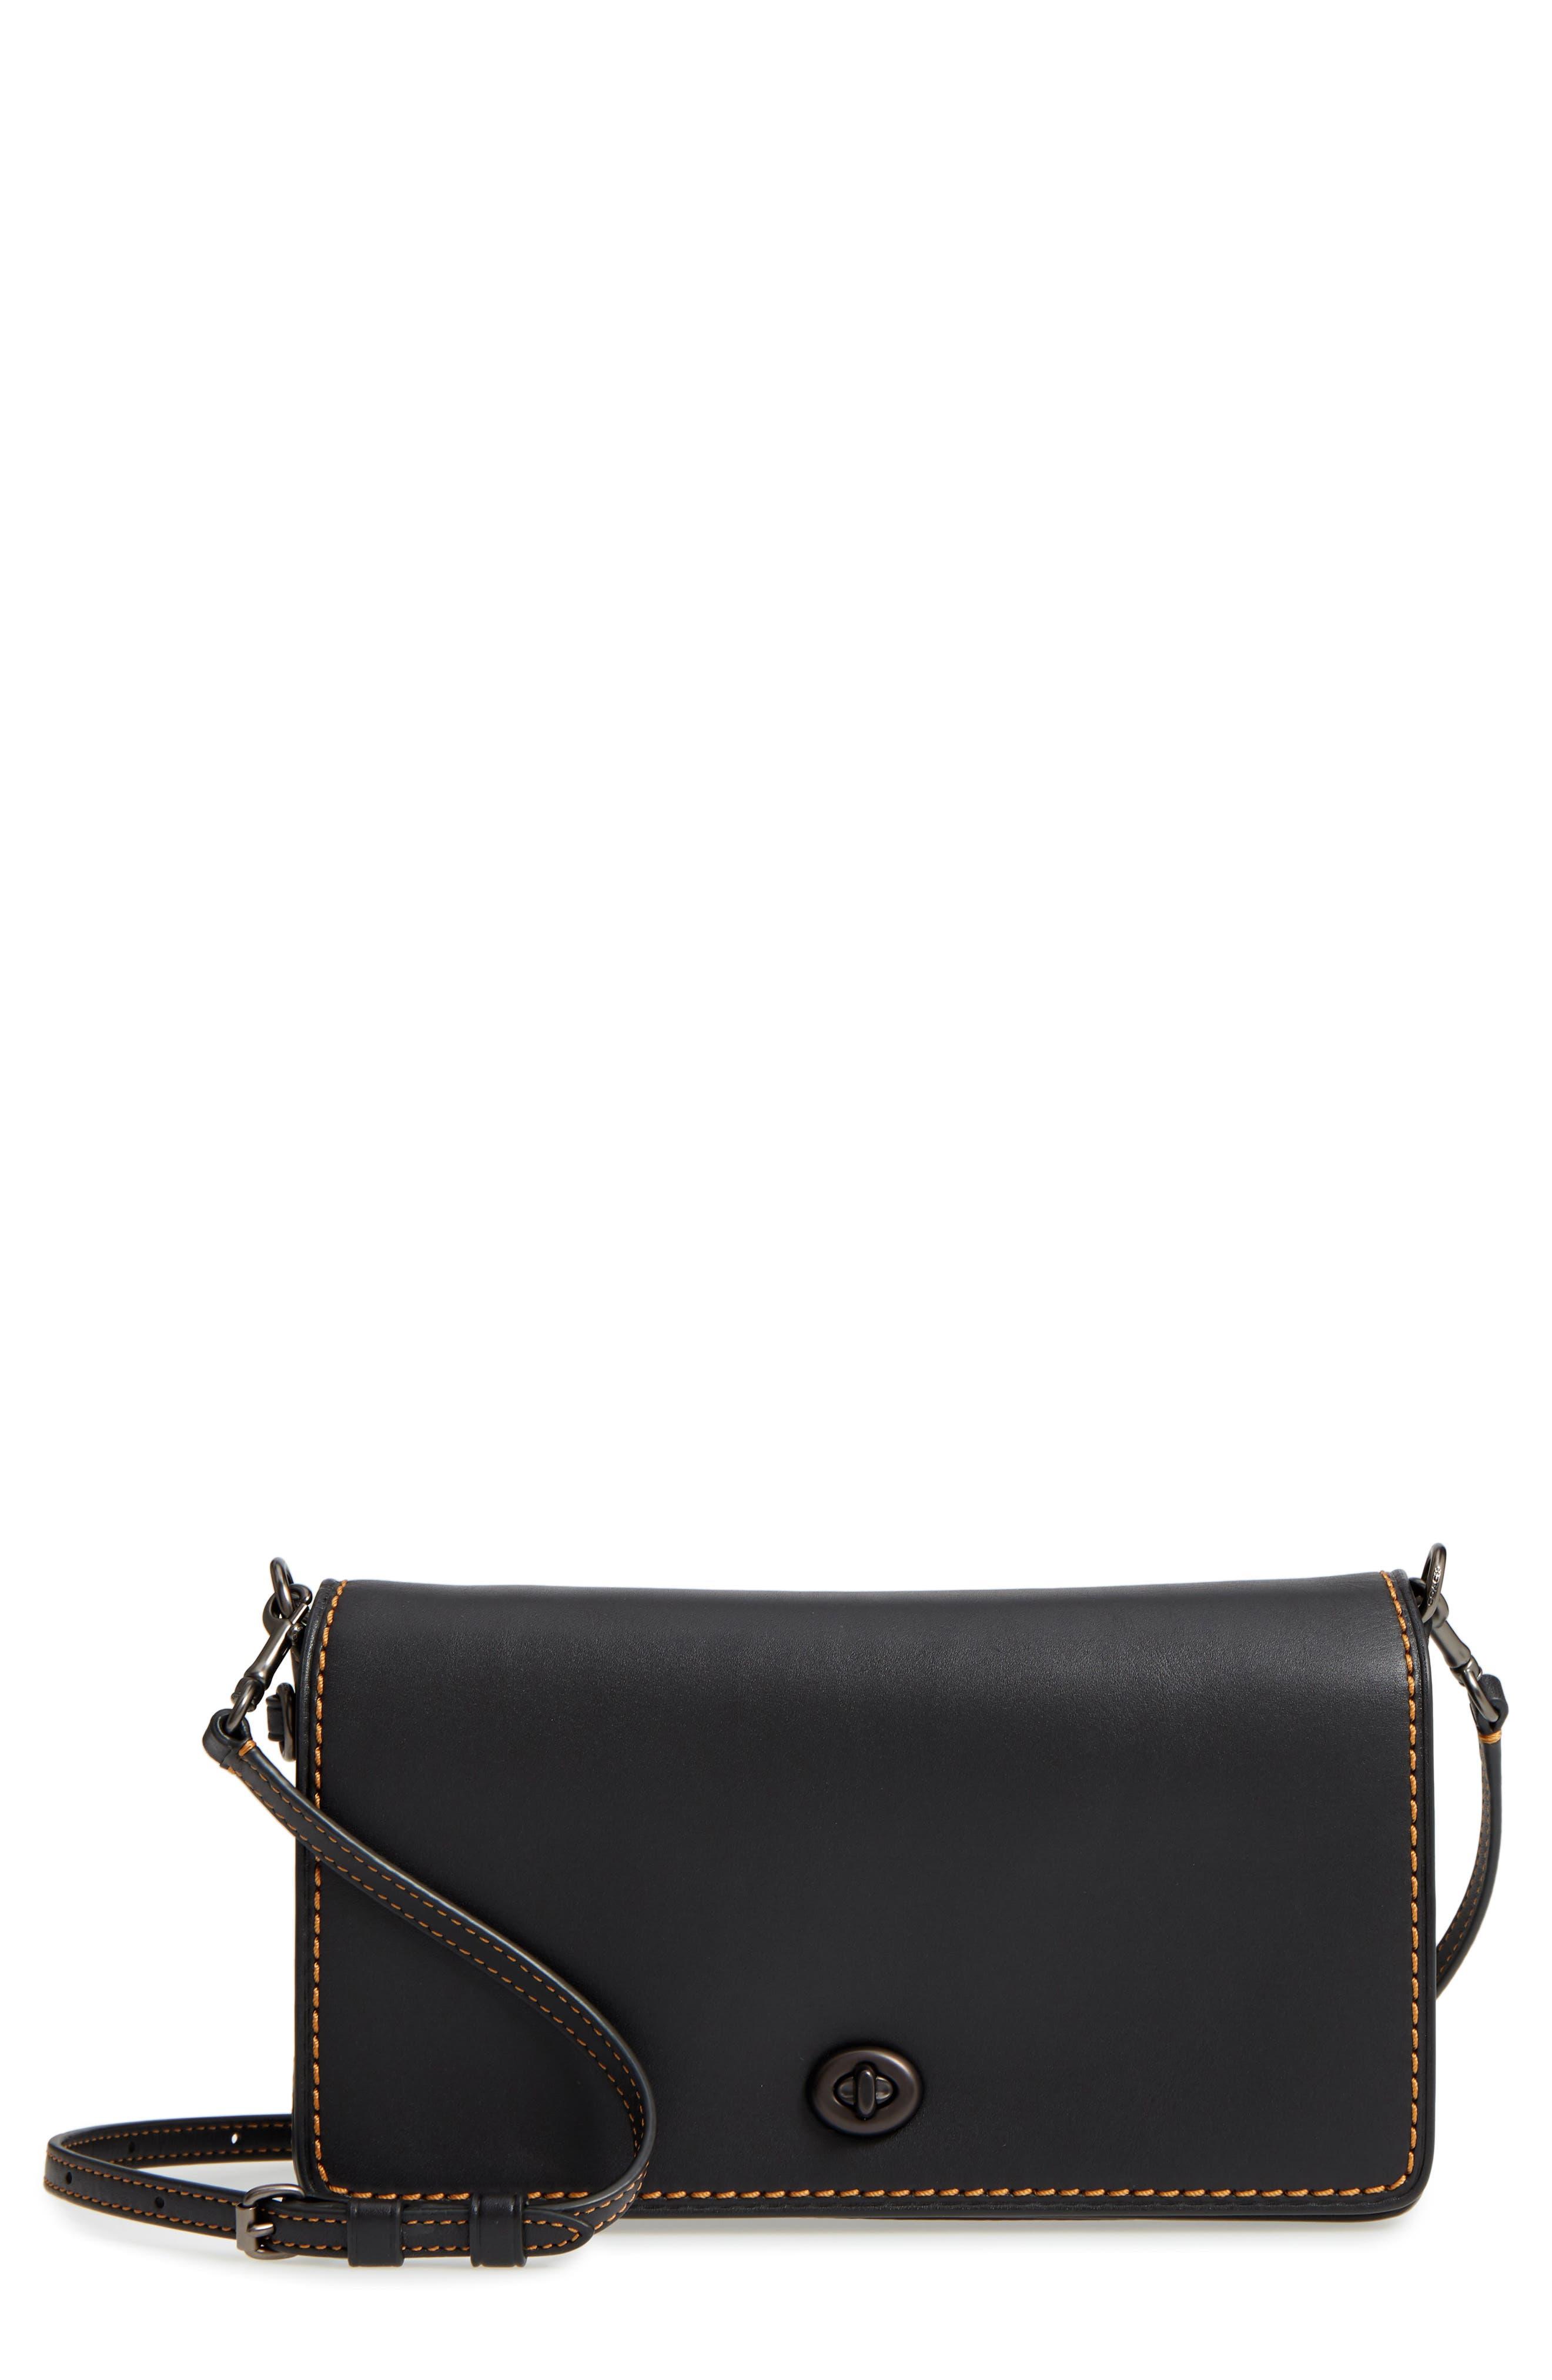 Dinky Crossbody Bag in Black Calfskin Coach j08QYk